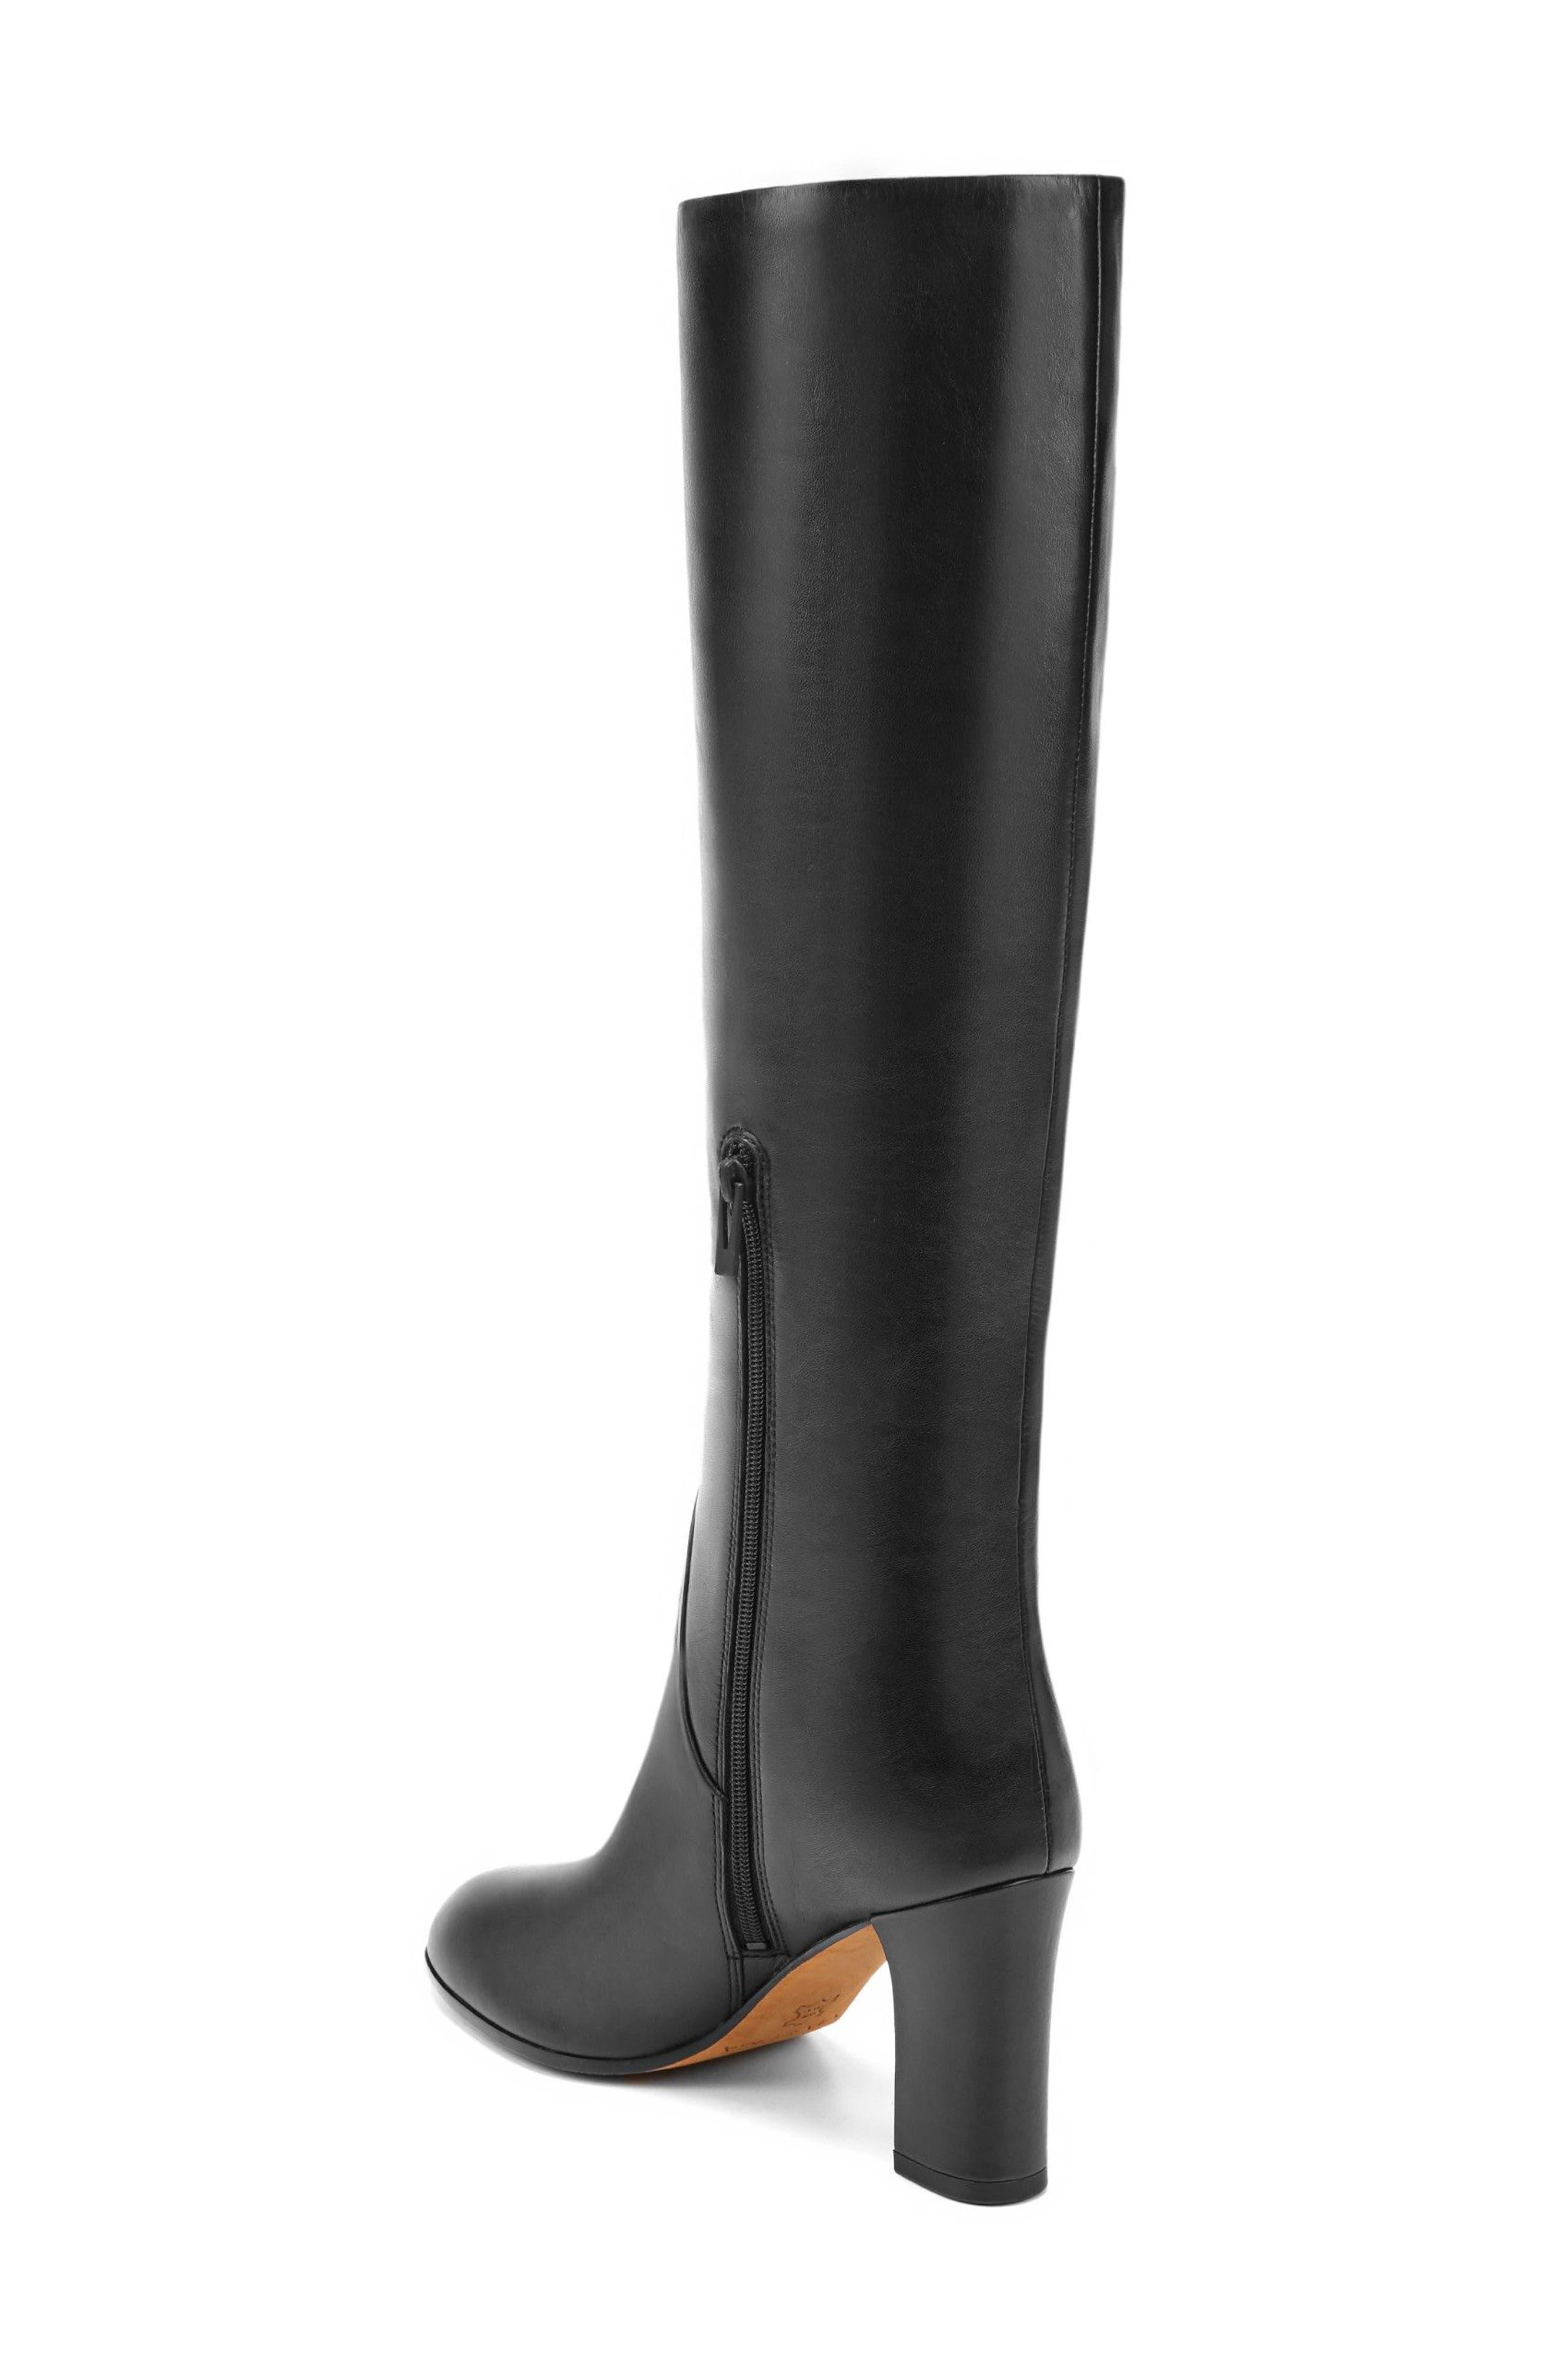 Soho Knee High Boot,                             Alternate thumbnail 2, color,                             Onyx Leather